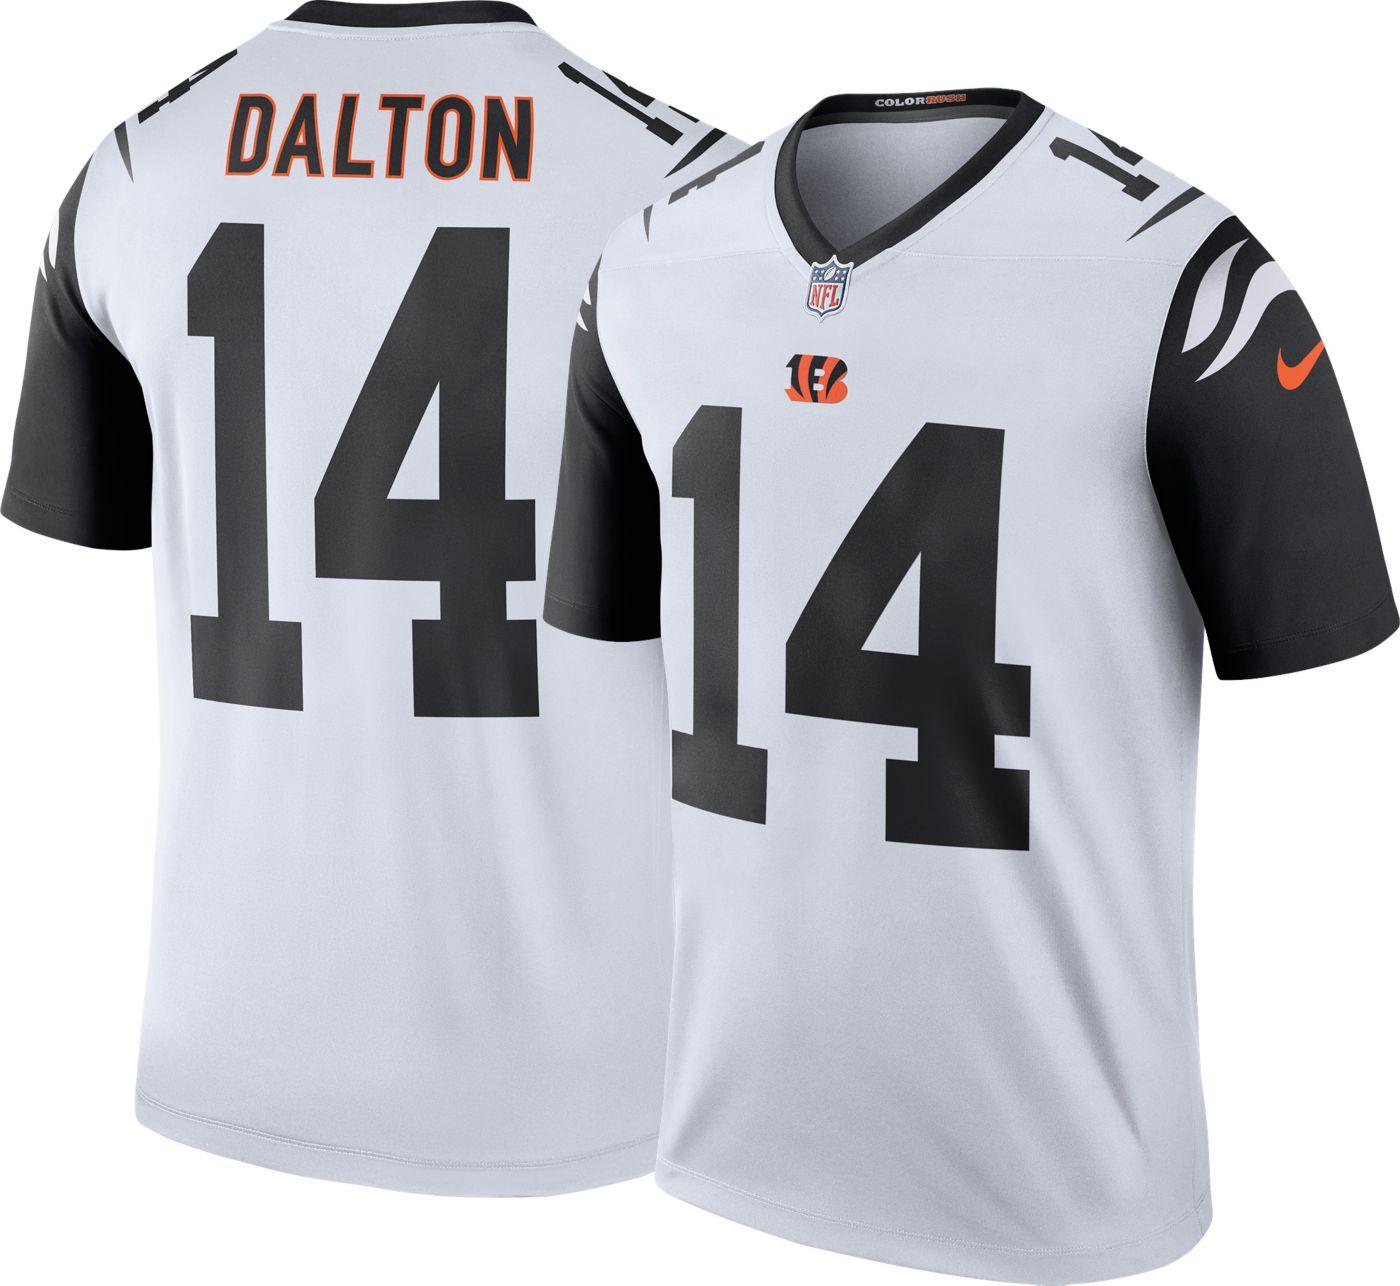 Nike Men's Color Rush Cincinnati Bengals Andy Dalton #14 Legend Jersey